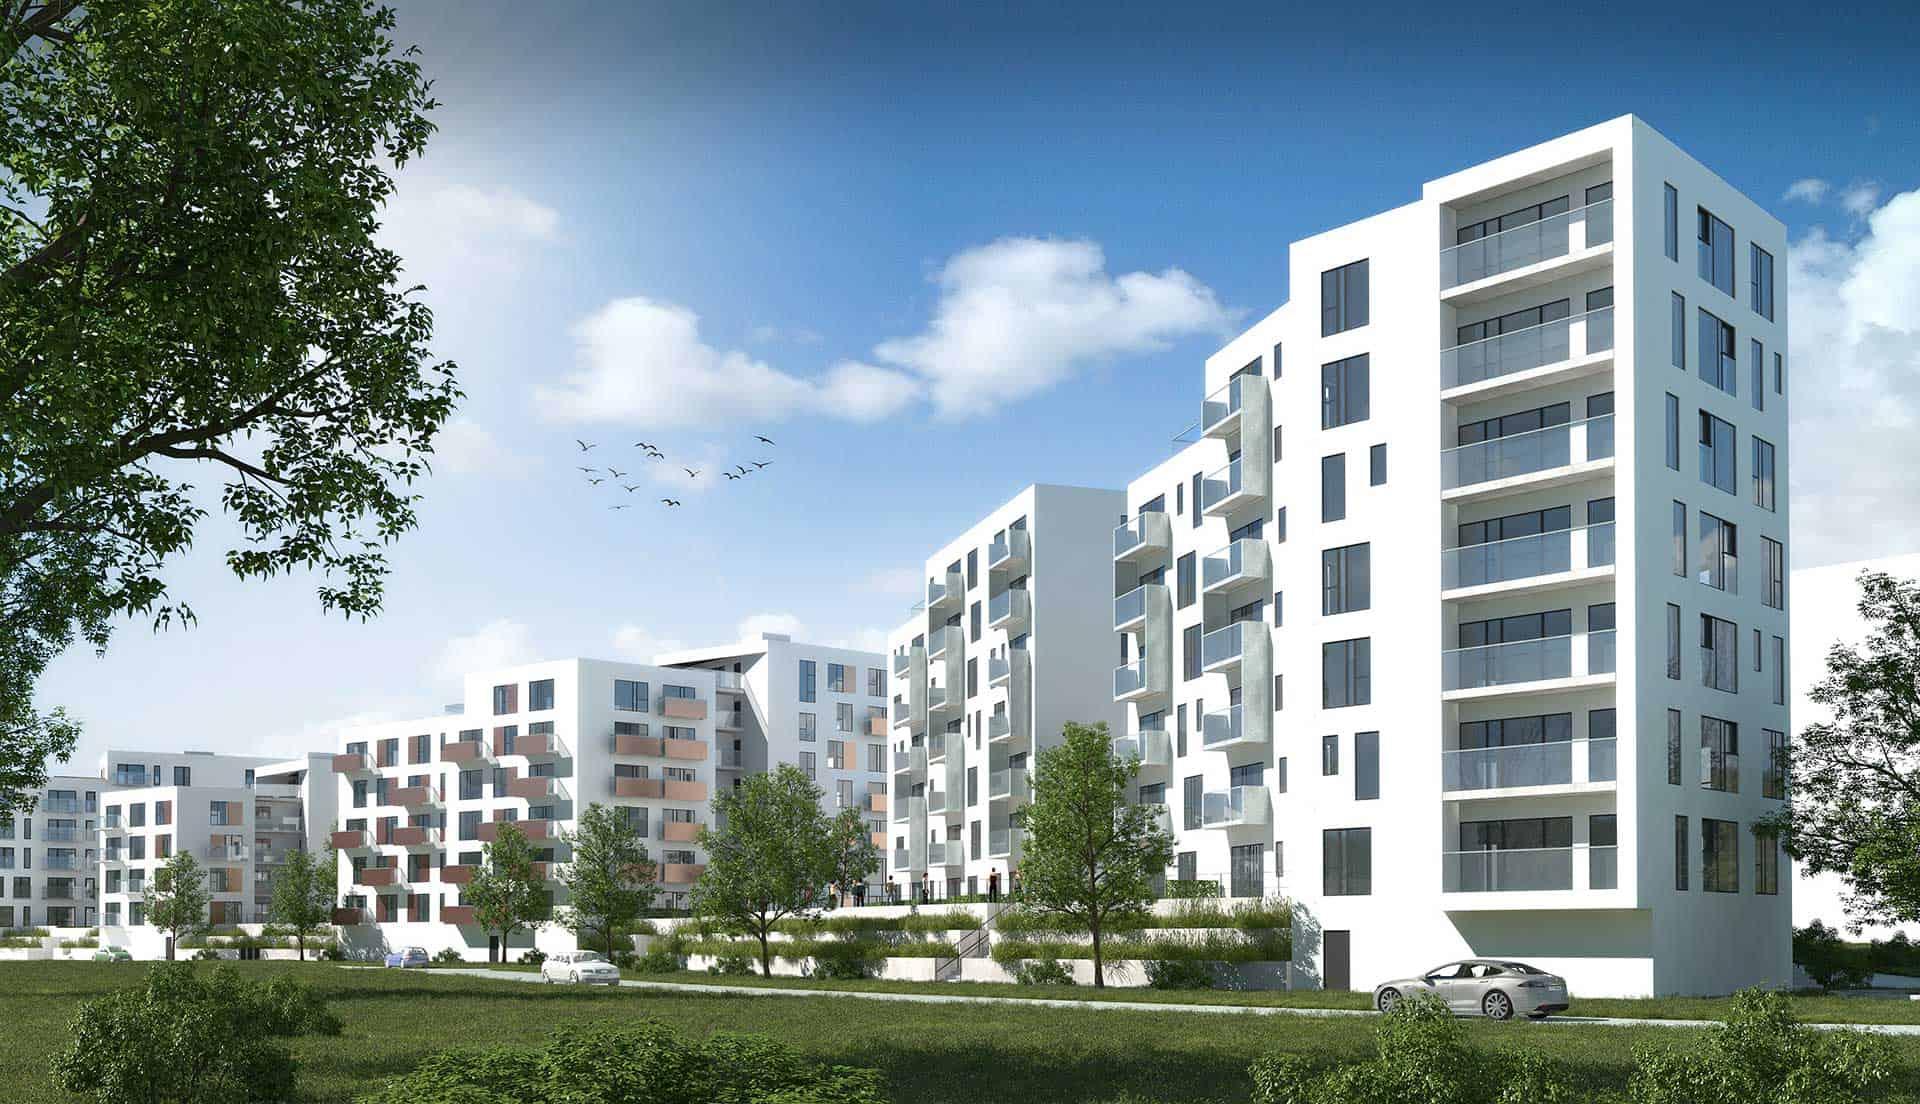 DADES Investerer I Toldbodhuse I Odense